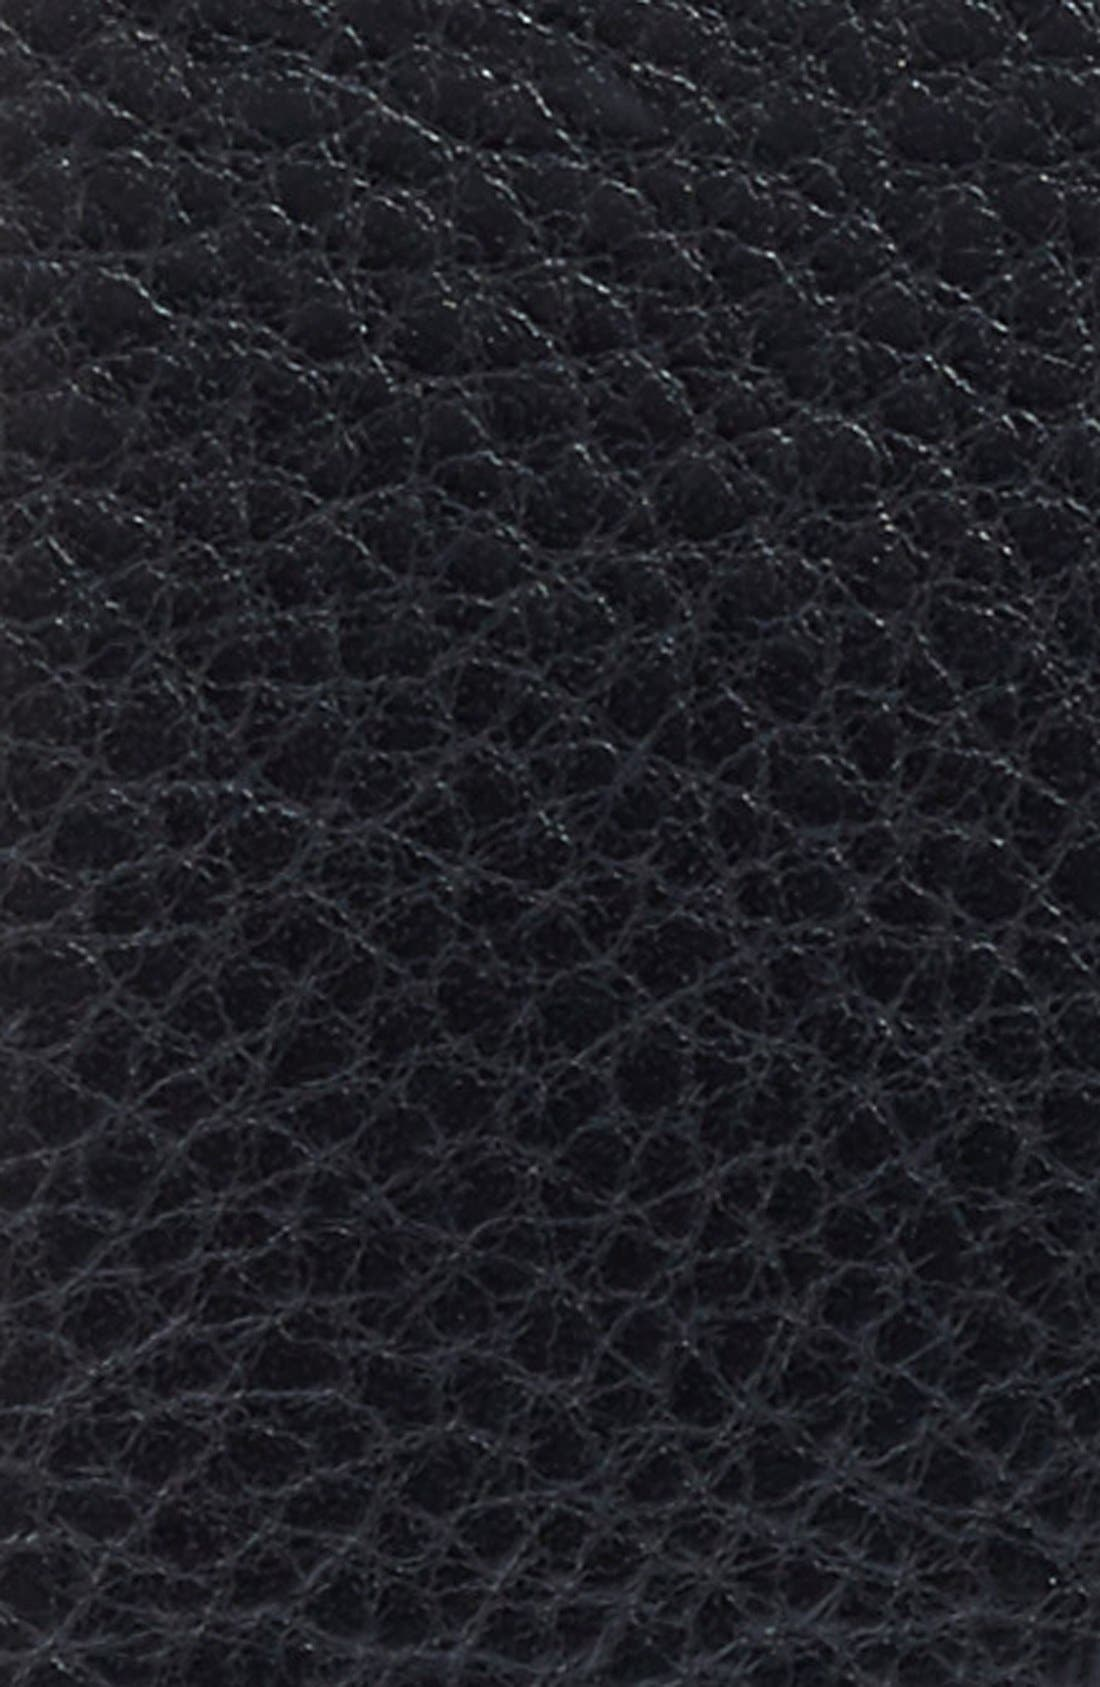 Bosca Heavyweight Leather Belt, Black